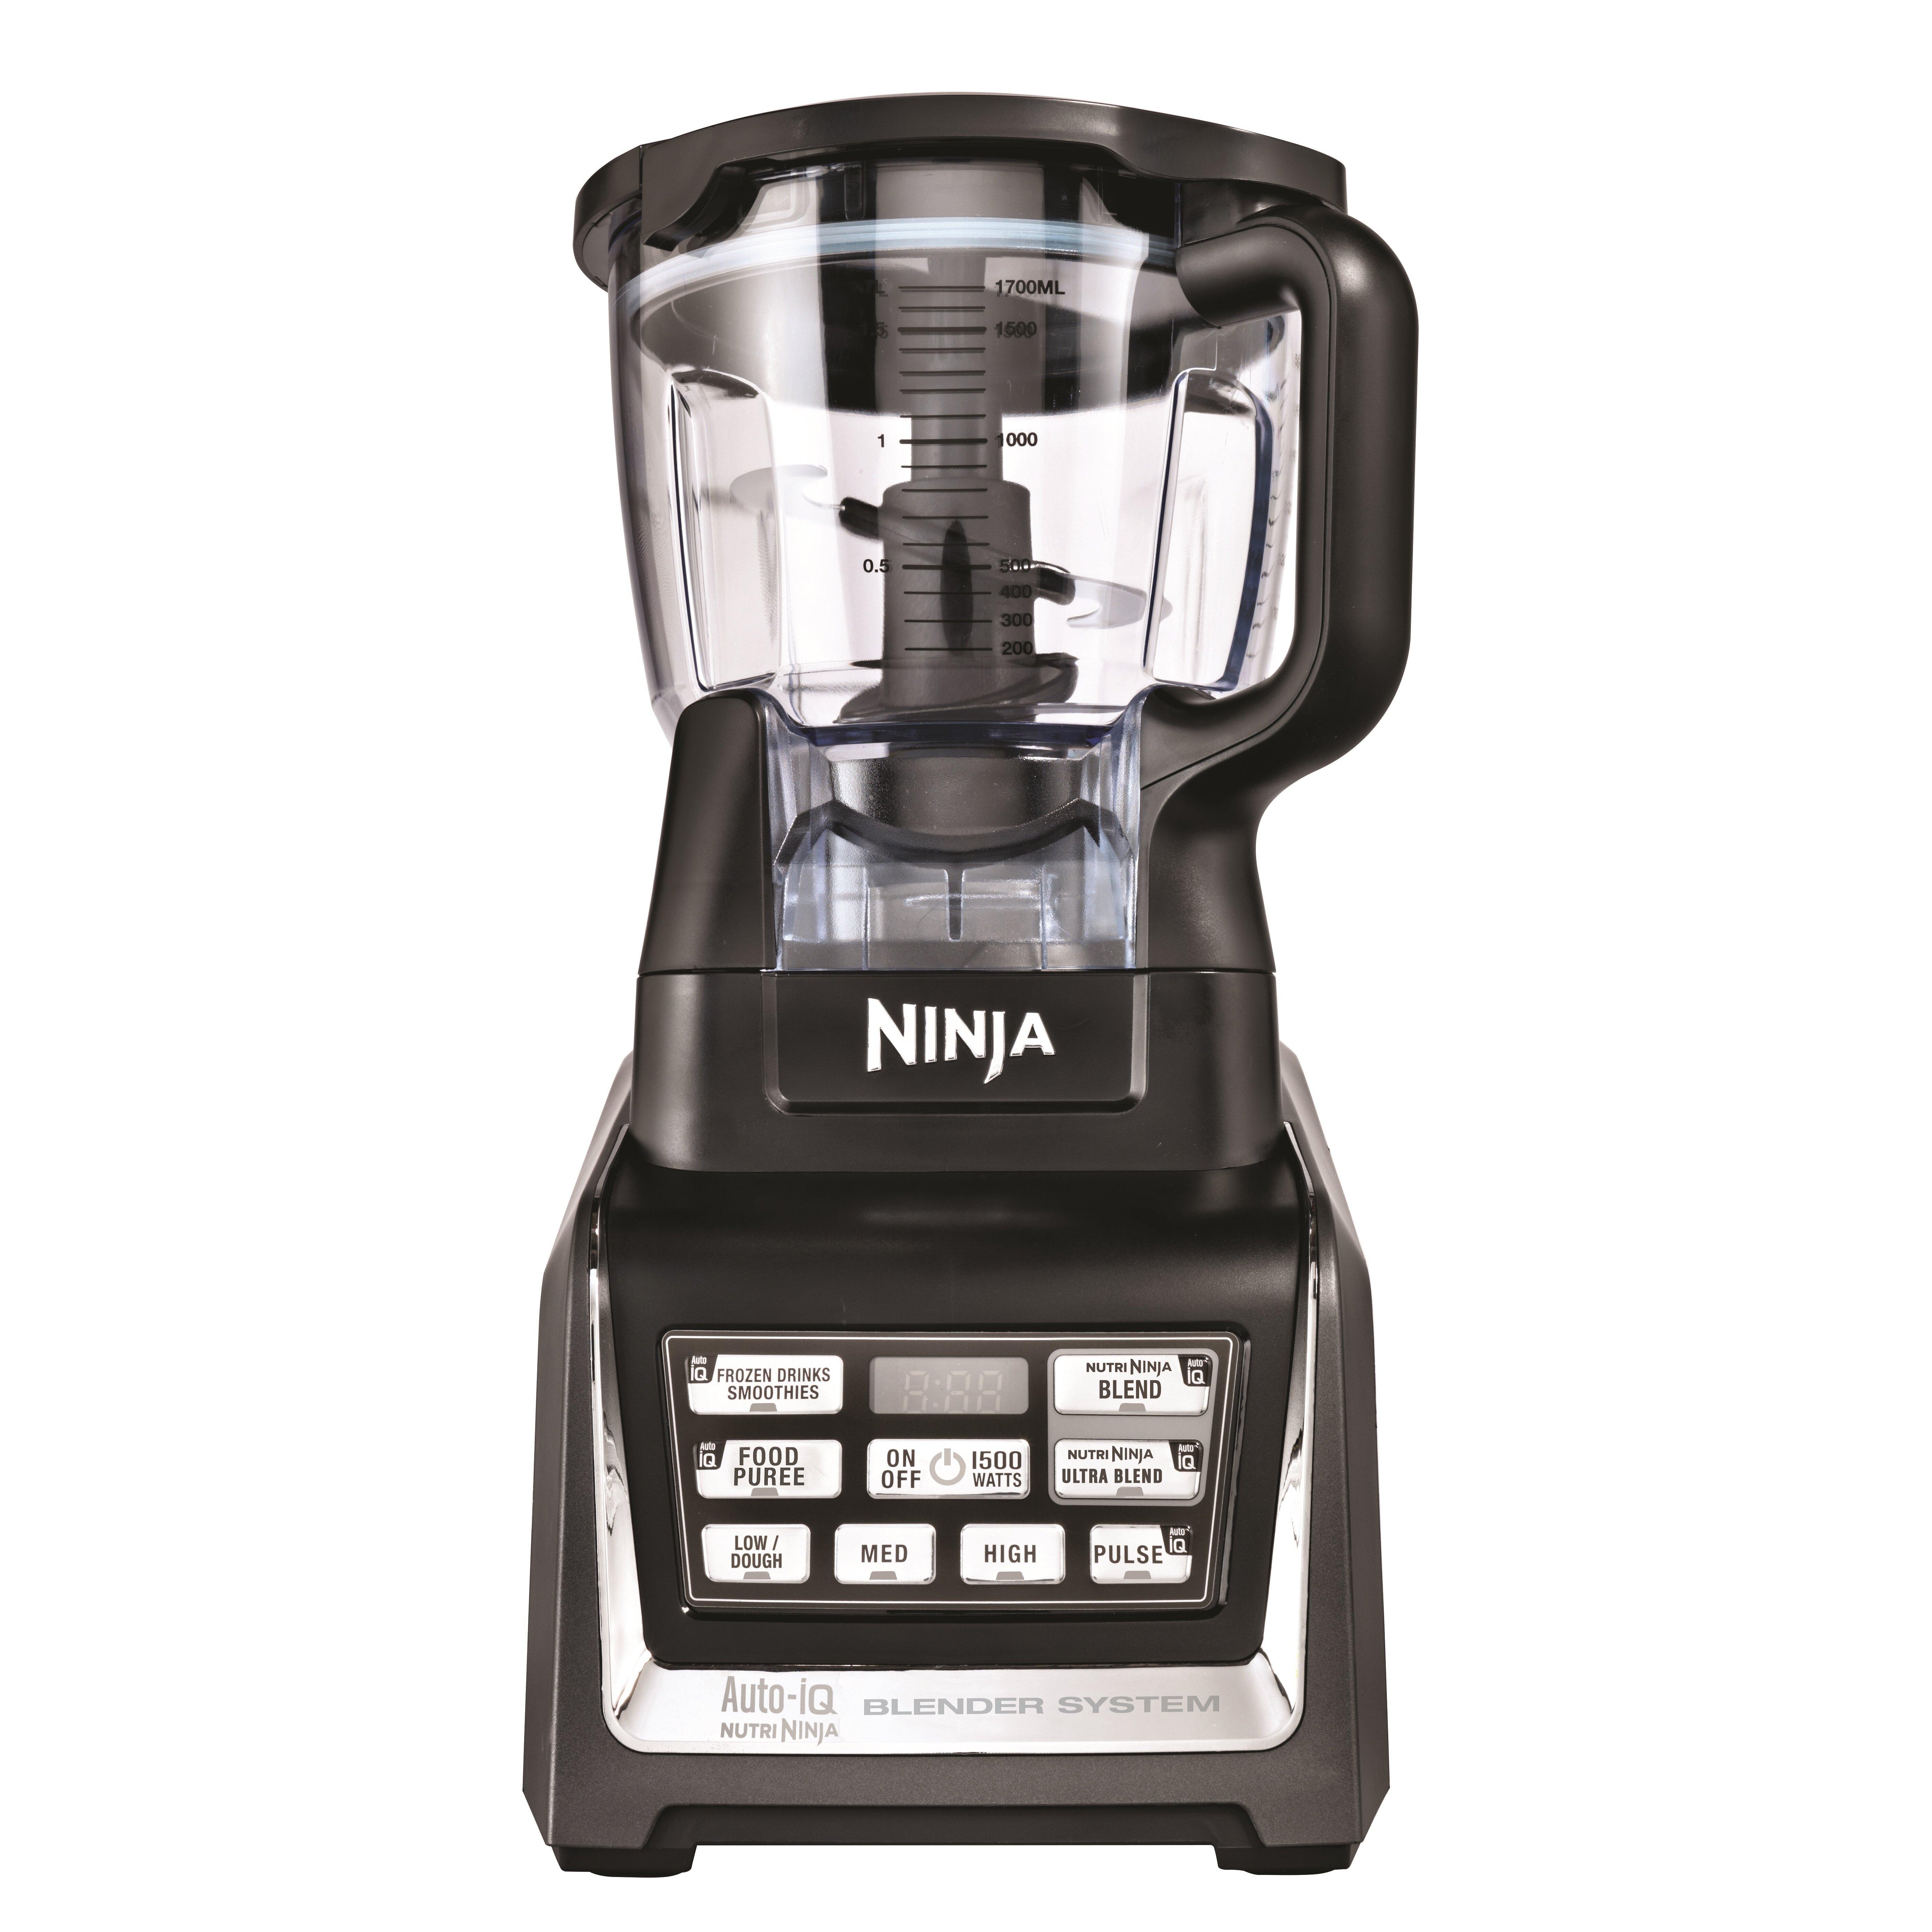 Ninja Nutri Blender Wayfair : Ninja Nutri Blender from www.wayfair.com size 5621 x 5621 jpeg 2183kB